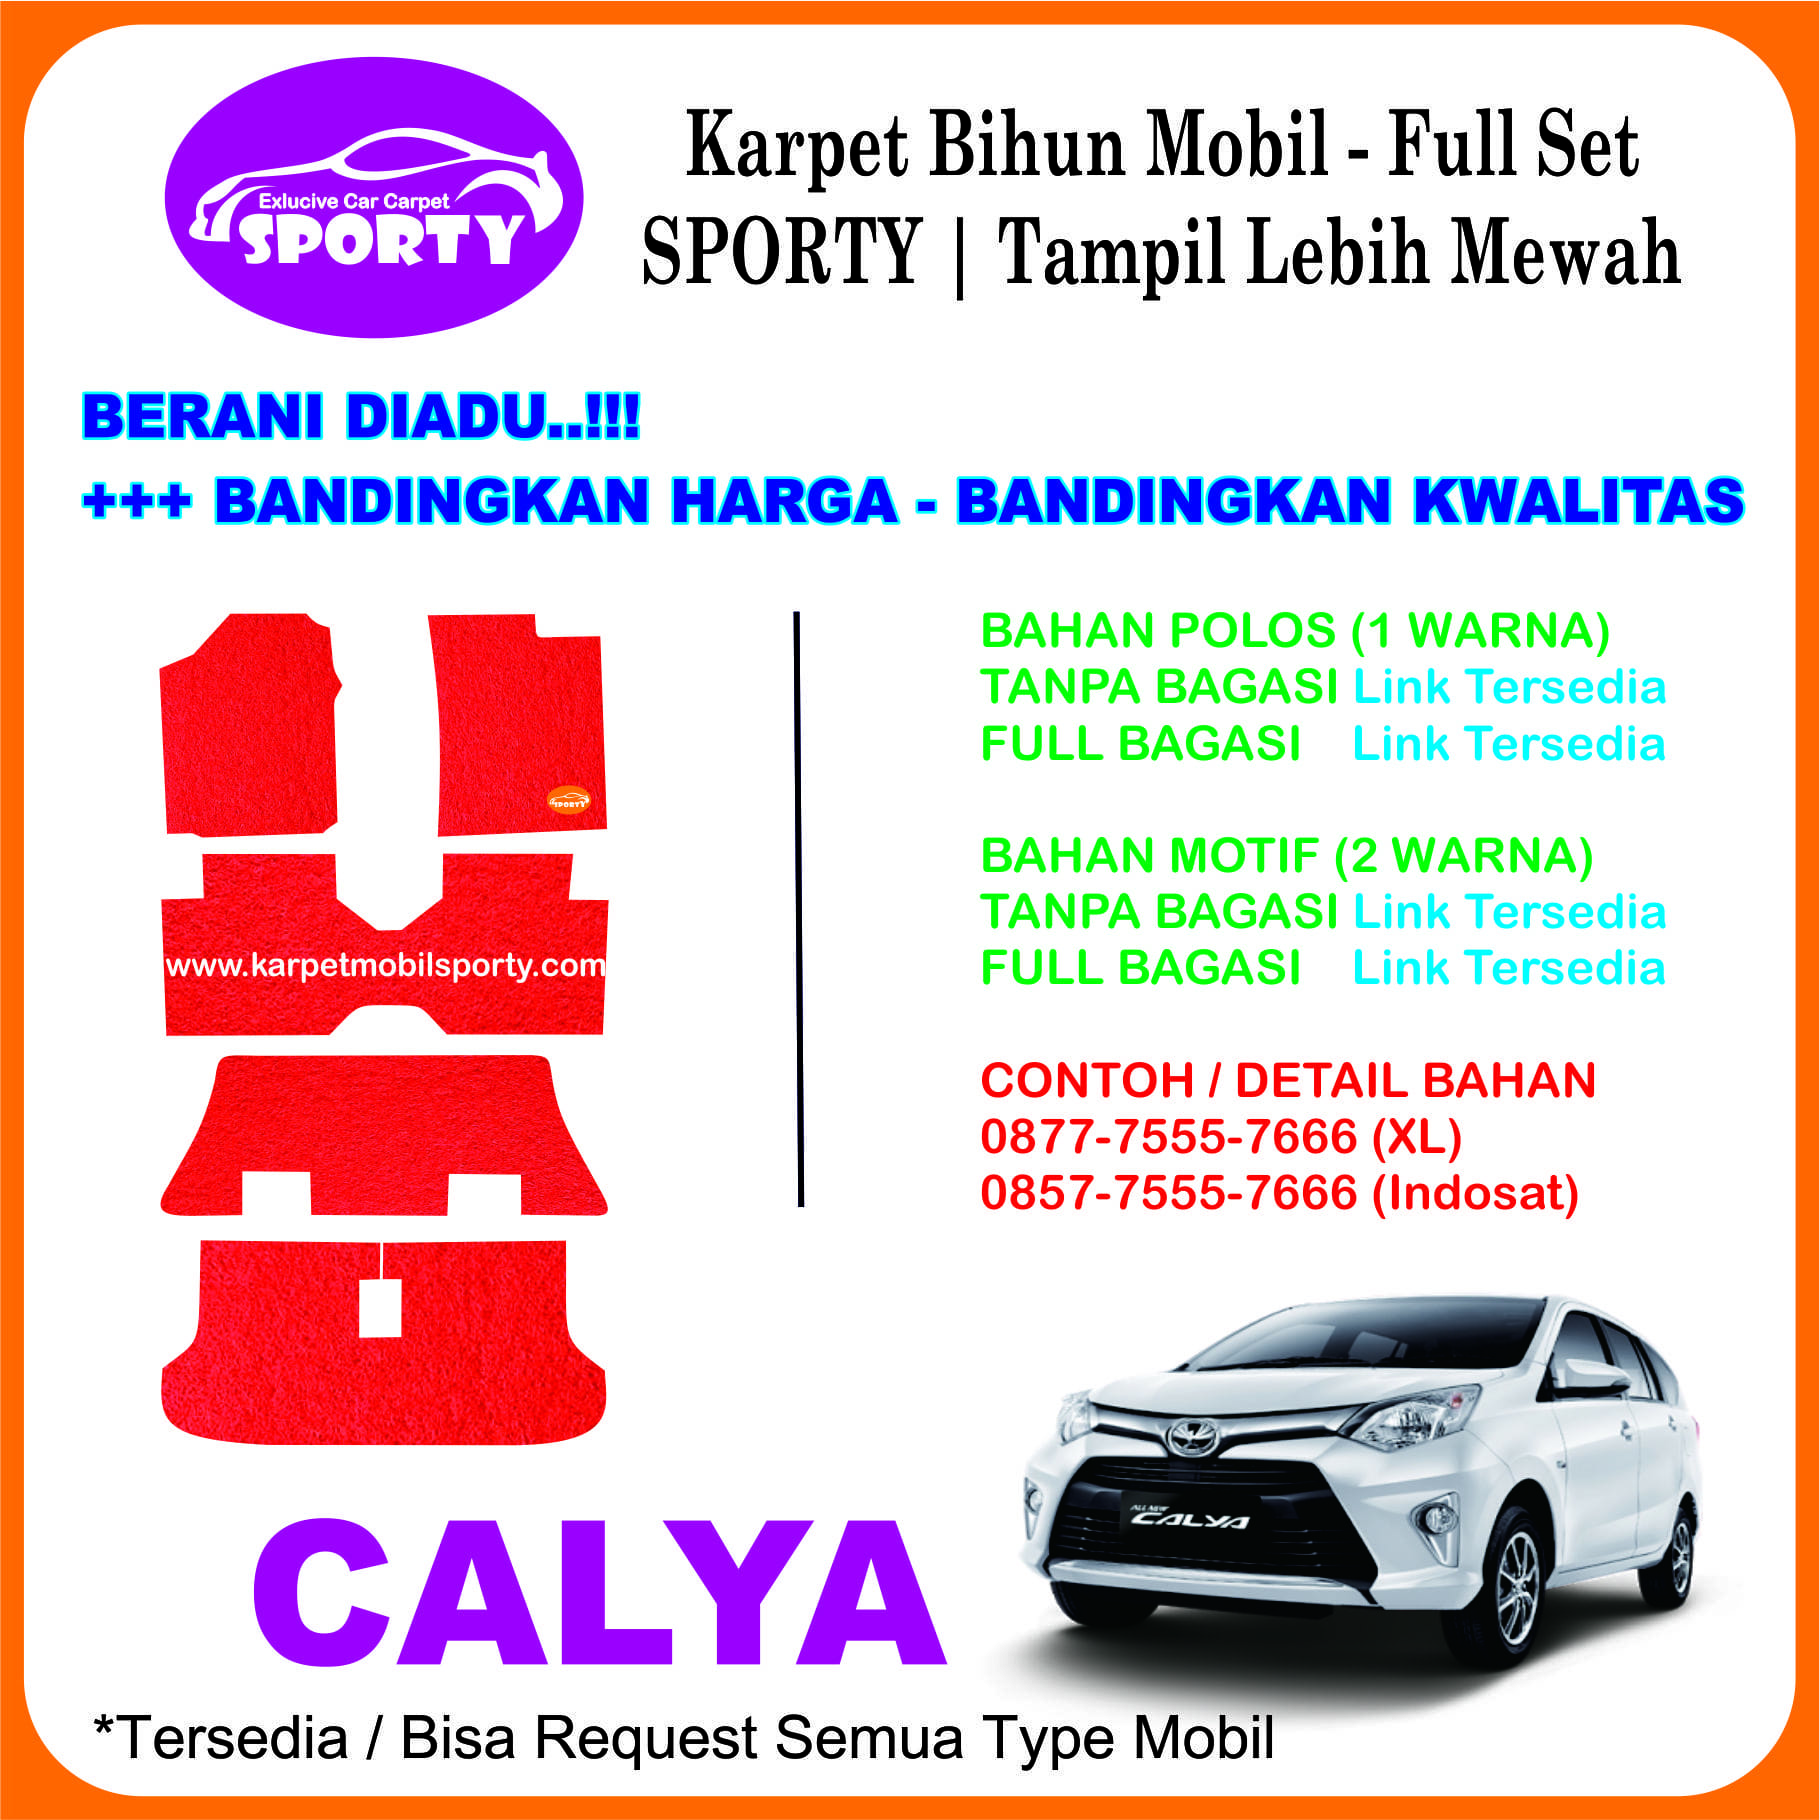 Karpet Mobil Mie Bihun CALYA Non Bagasi